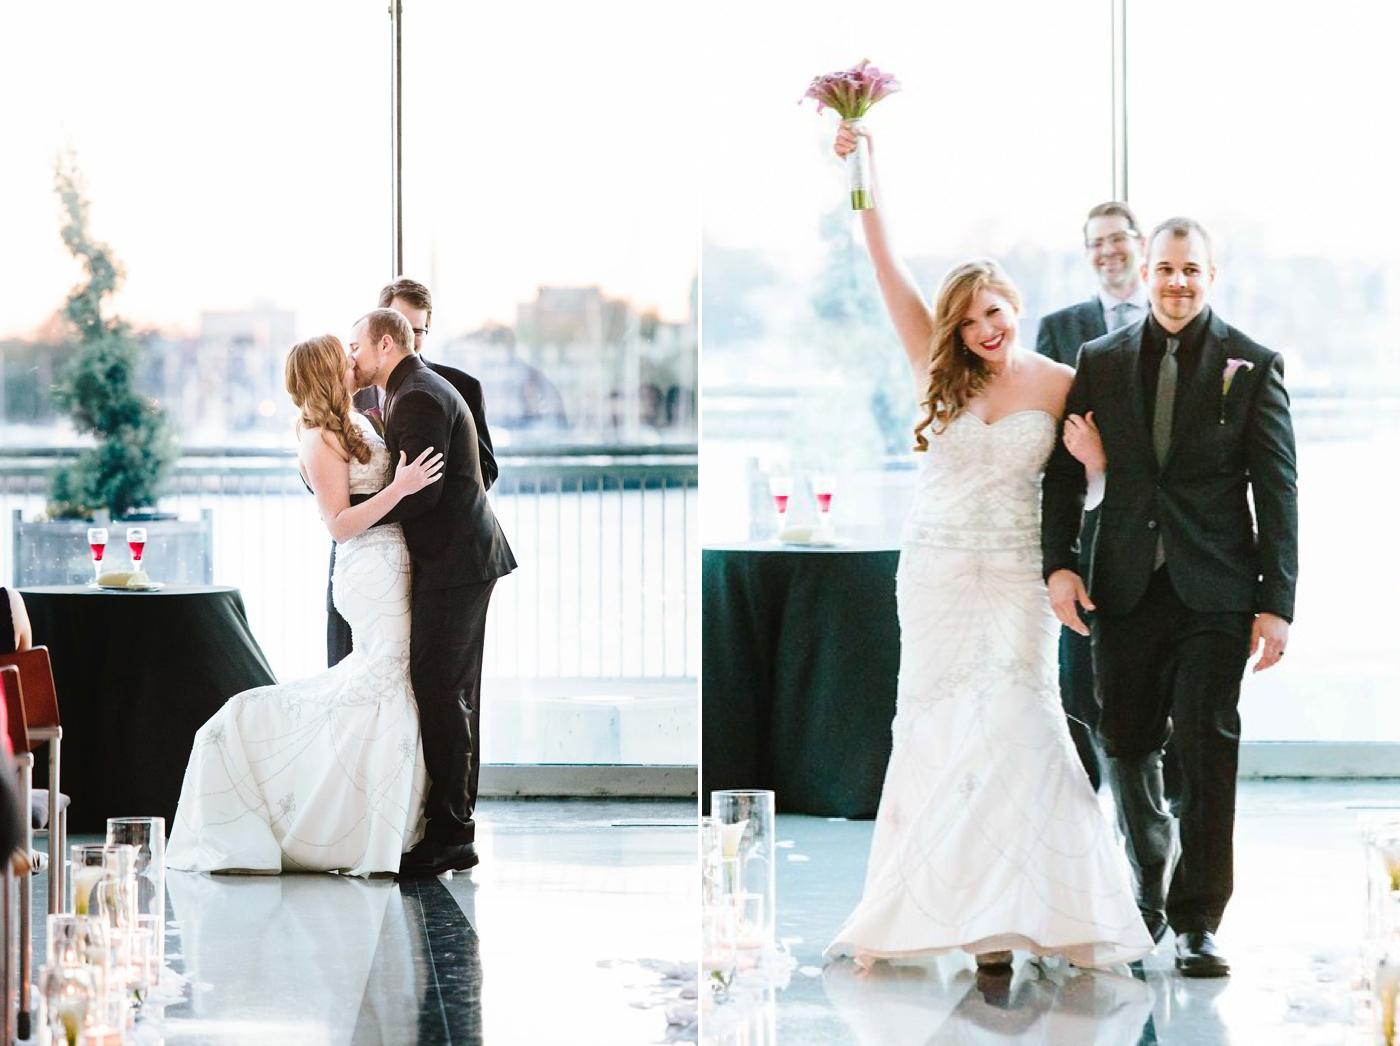 chicago-fine-art-wedding-photography-burnette23